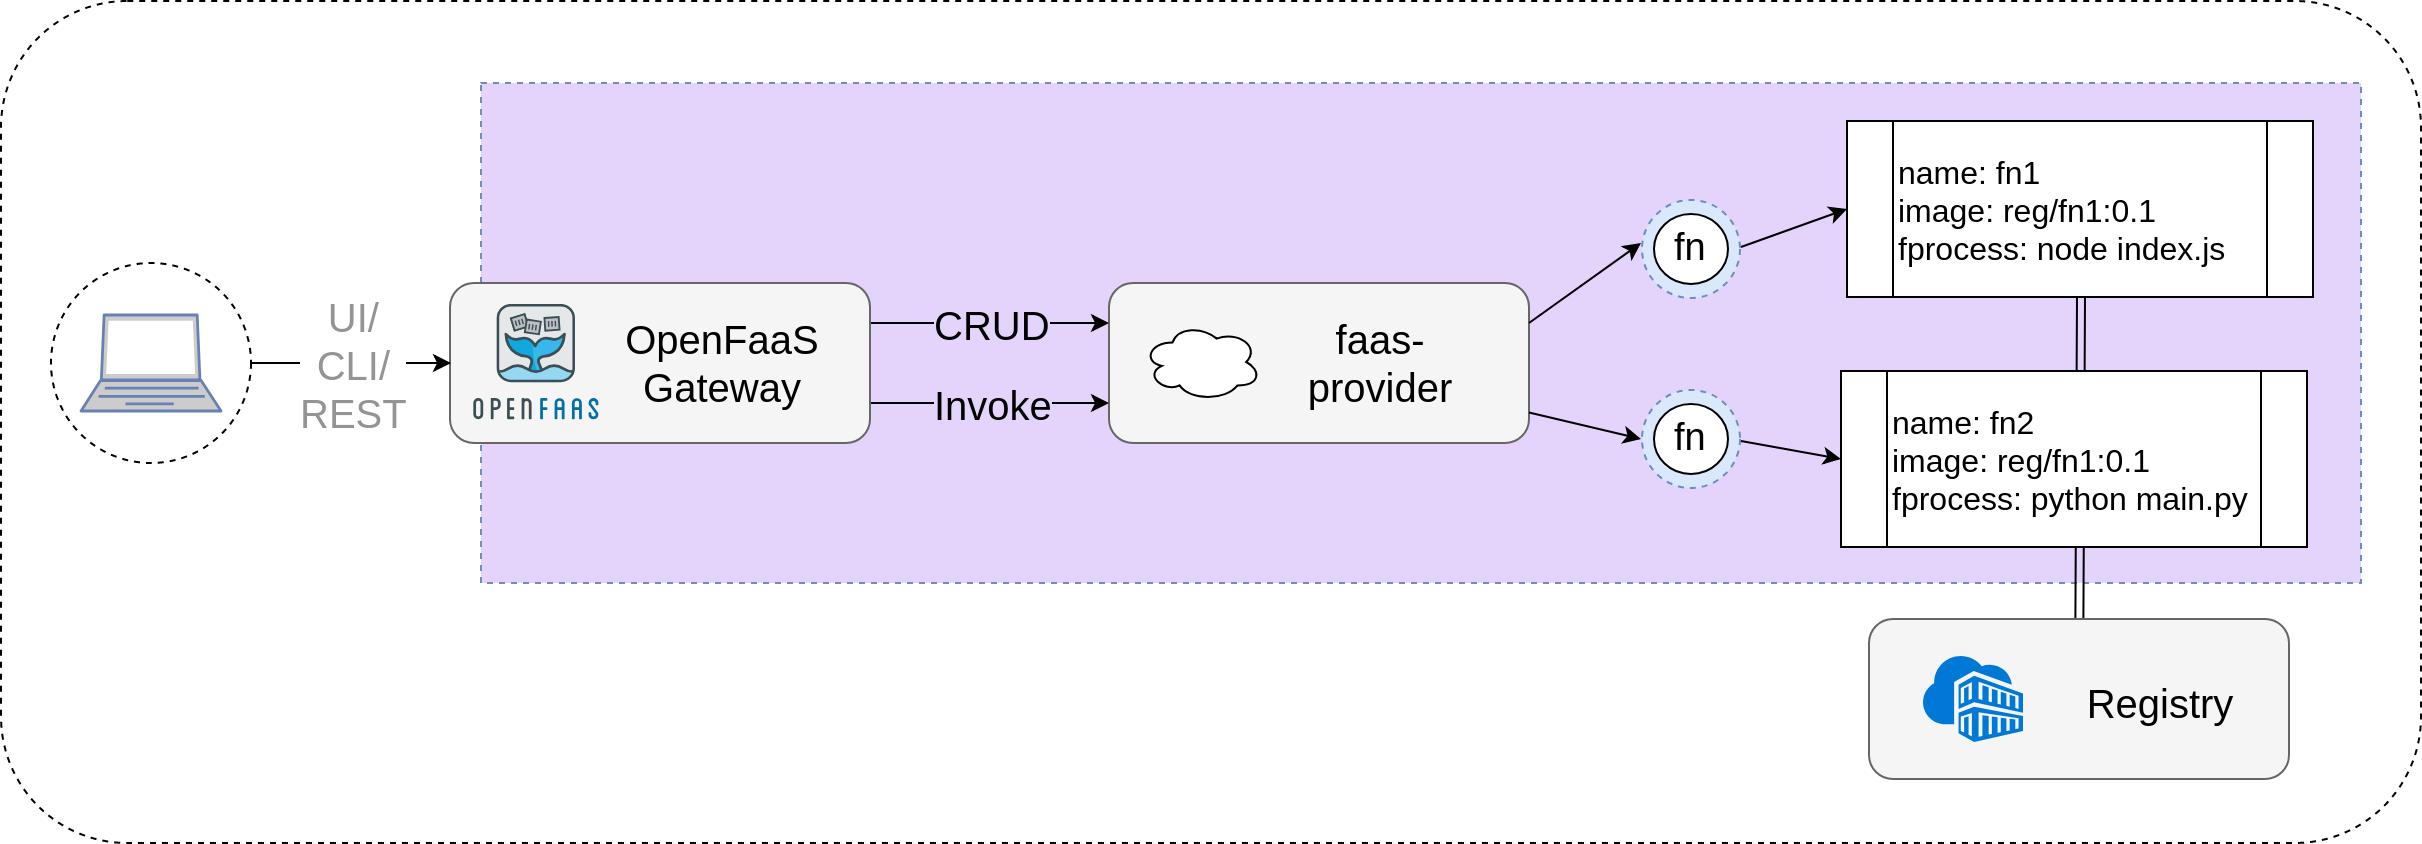 Conceptual diagram